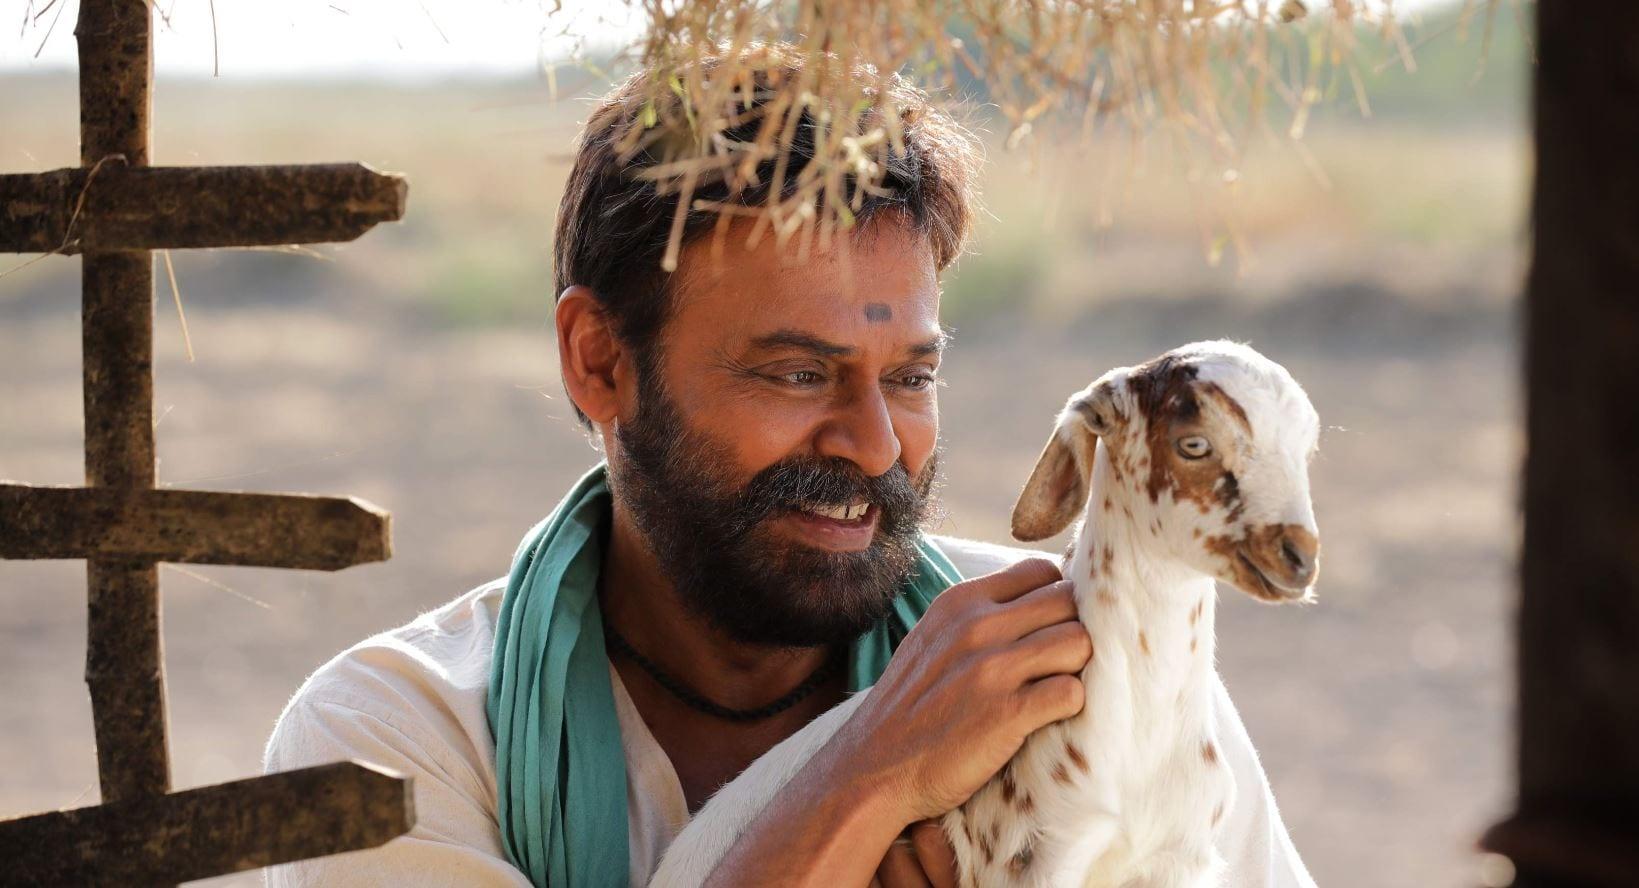 Narappa Telugu Movie Release Date, Plot, Cast Actors, Rating, Reviews